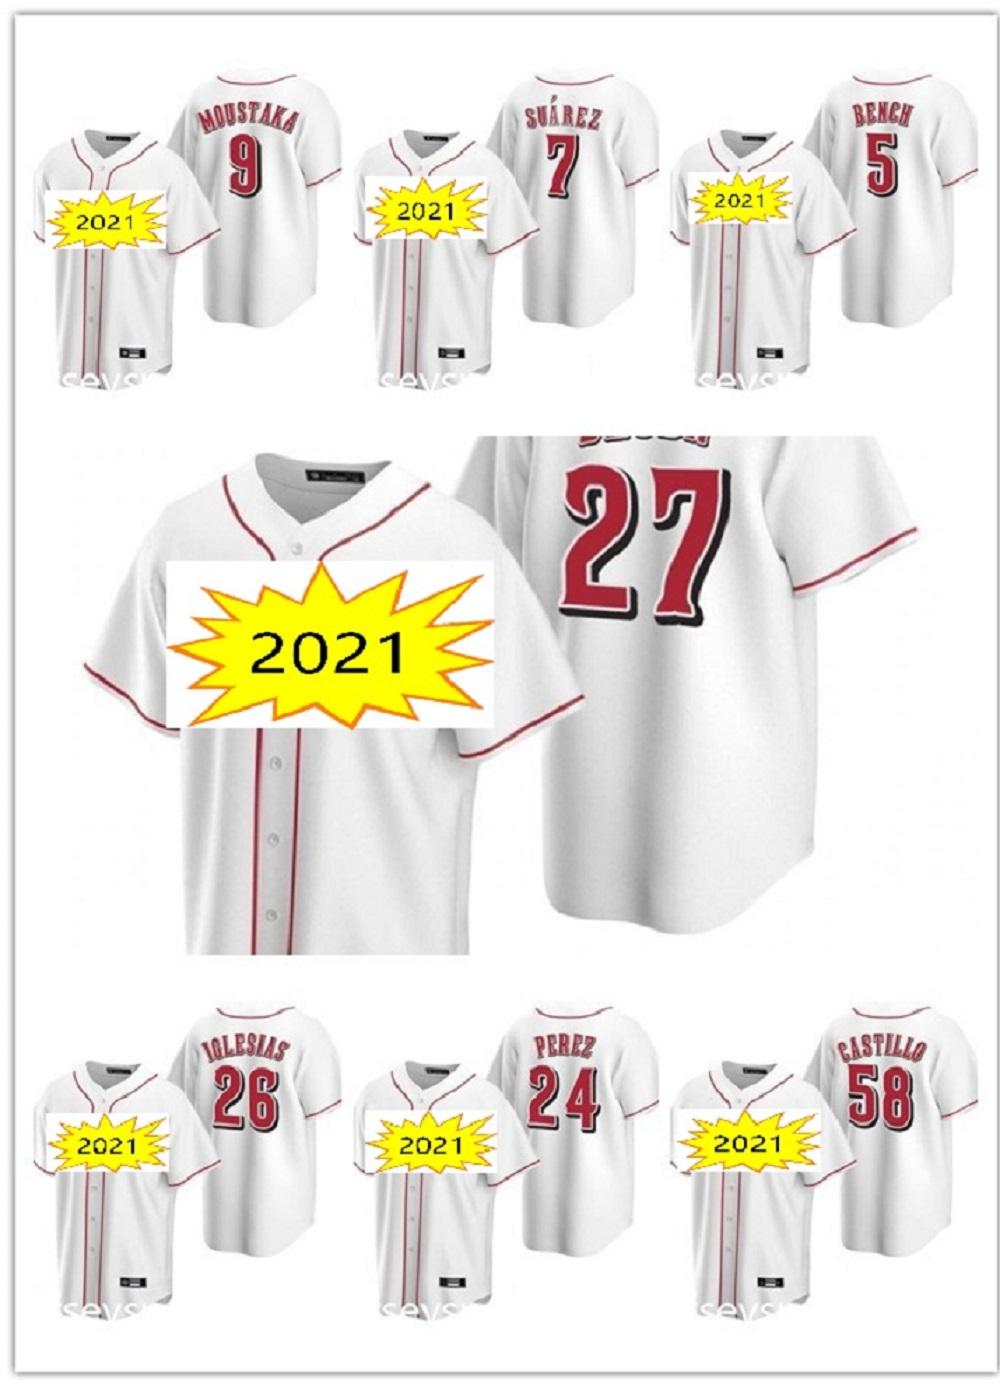 20 21 Cincinnati Aristides Aquino 남성 여성 아이들 빨간색 야구 유니폼 시즌 조이 votto raisel iglesias Jesse Winker Eugenio Johnny Scott